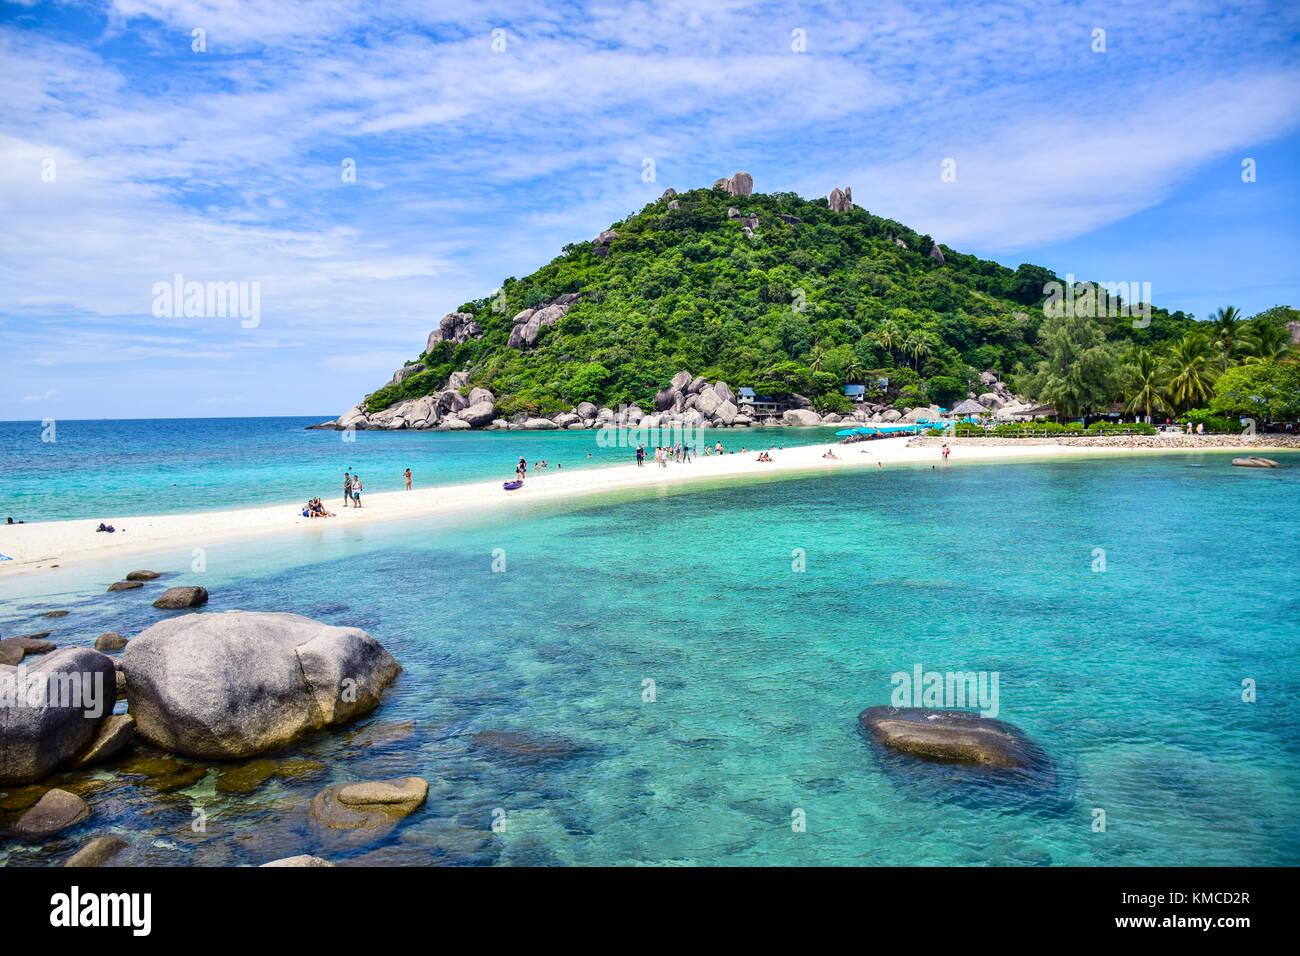 Beautiful Thailand beach of Nang Yuan island, the popular tourist destination near Samui island in gulf of Thailand - Stock Image